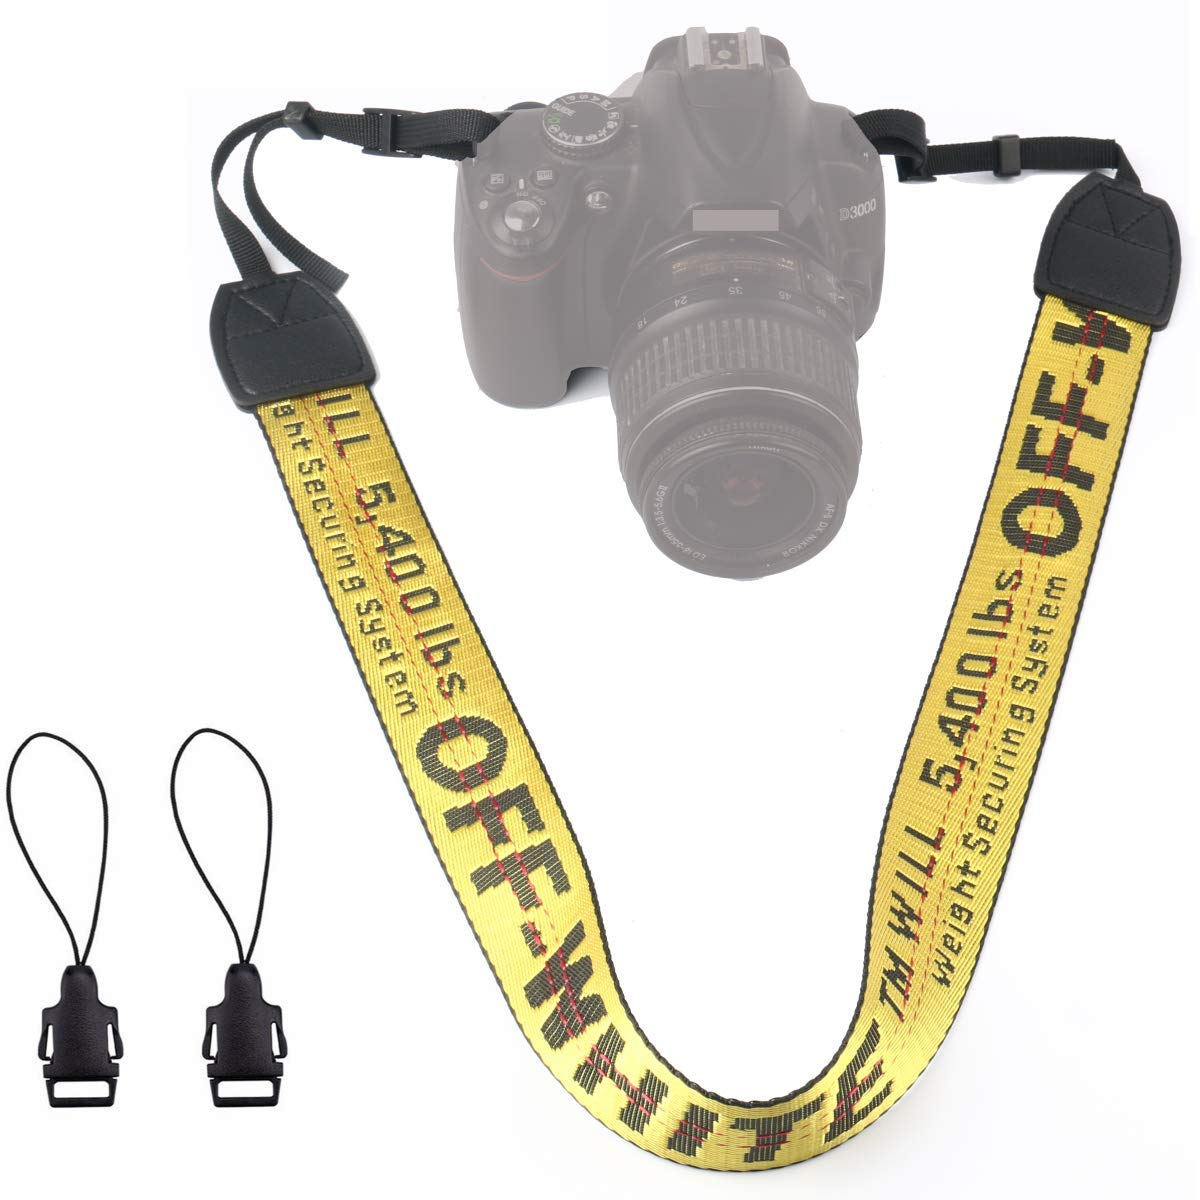 Alins Camera Shoulder Strap Fashion Universal Neck Belt for All DSLR Camera Nikon Canon Sony Pentax ect (Gold)